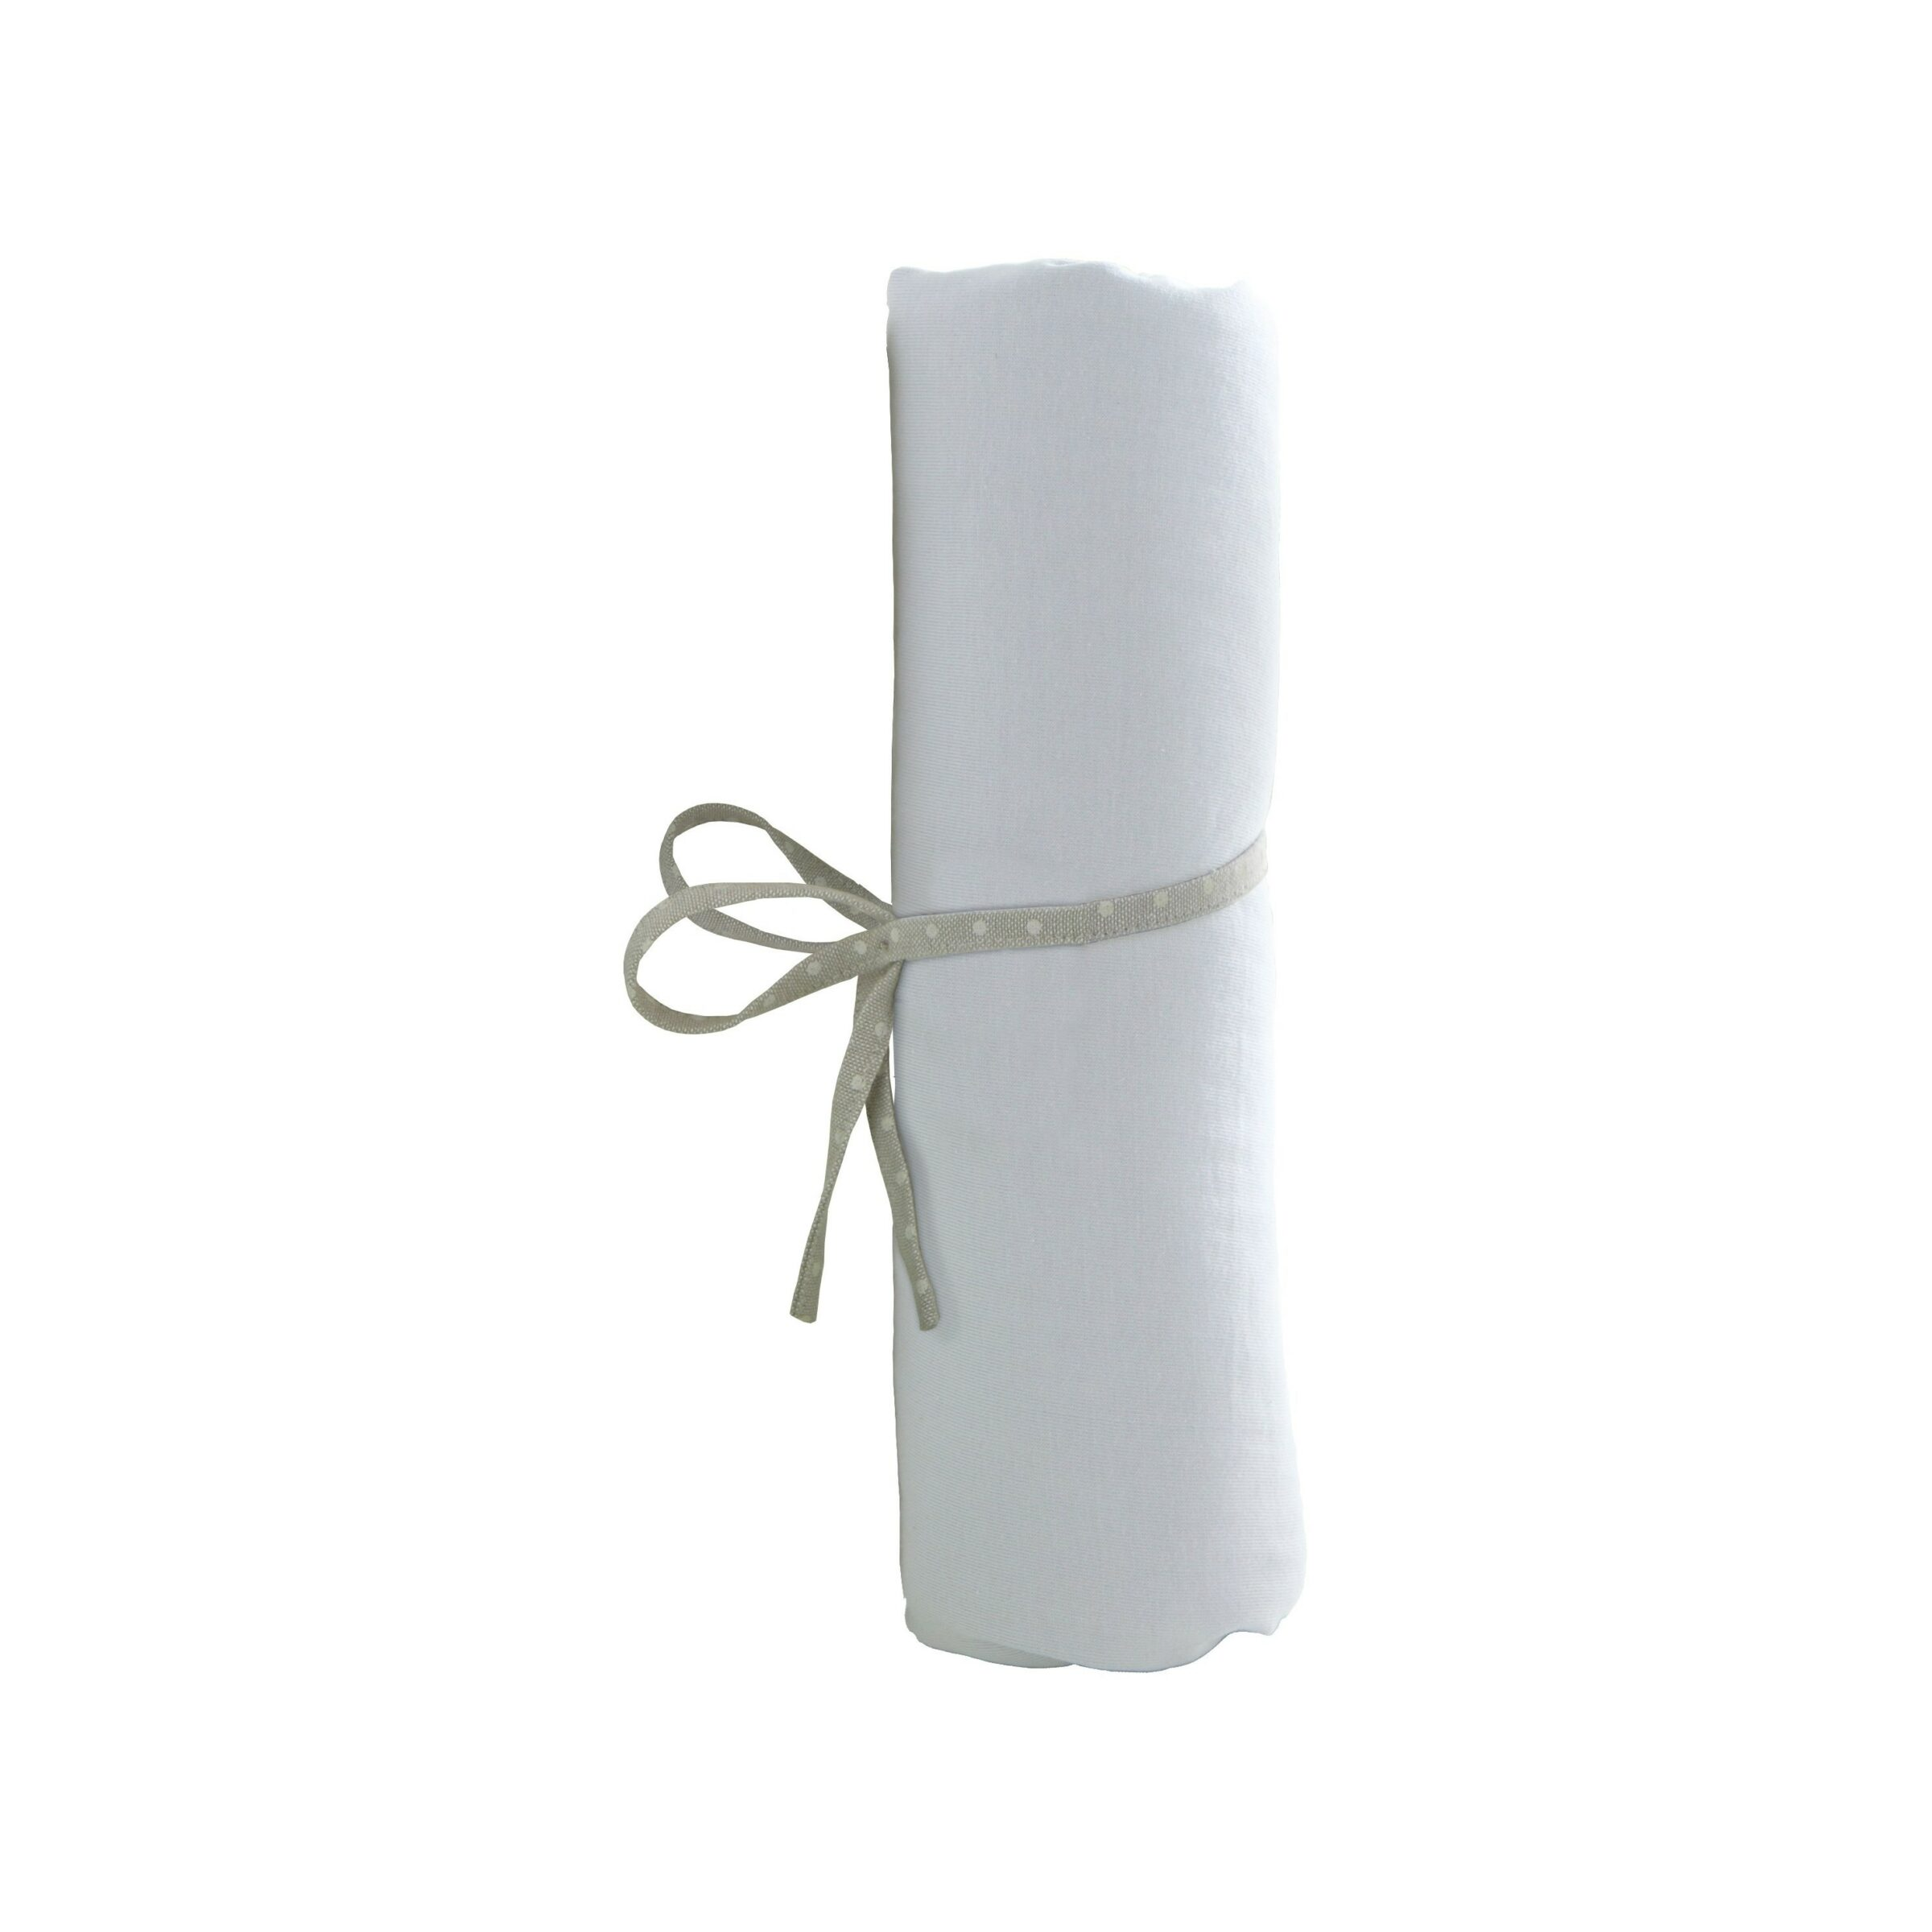 AT4 Drap Housse 60x120cm Blanc